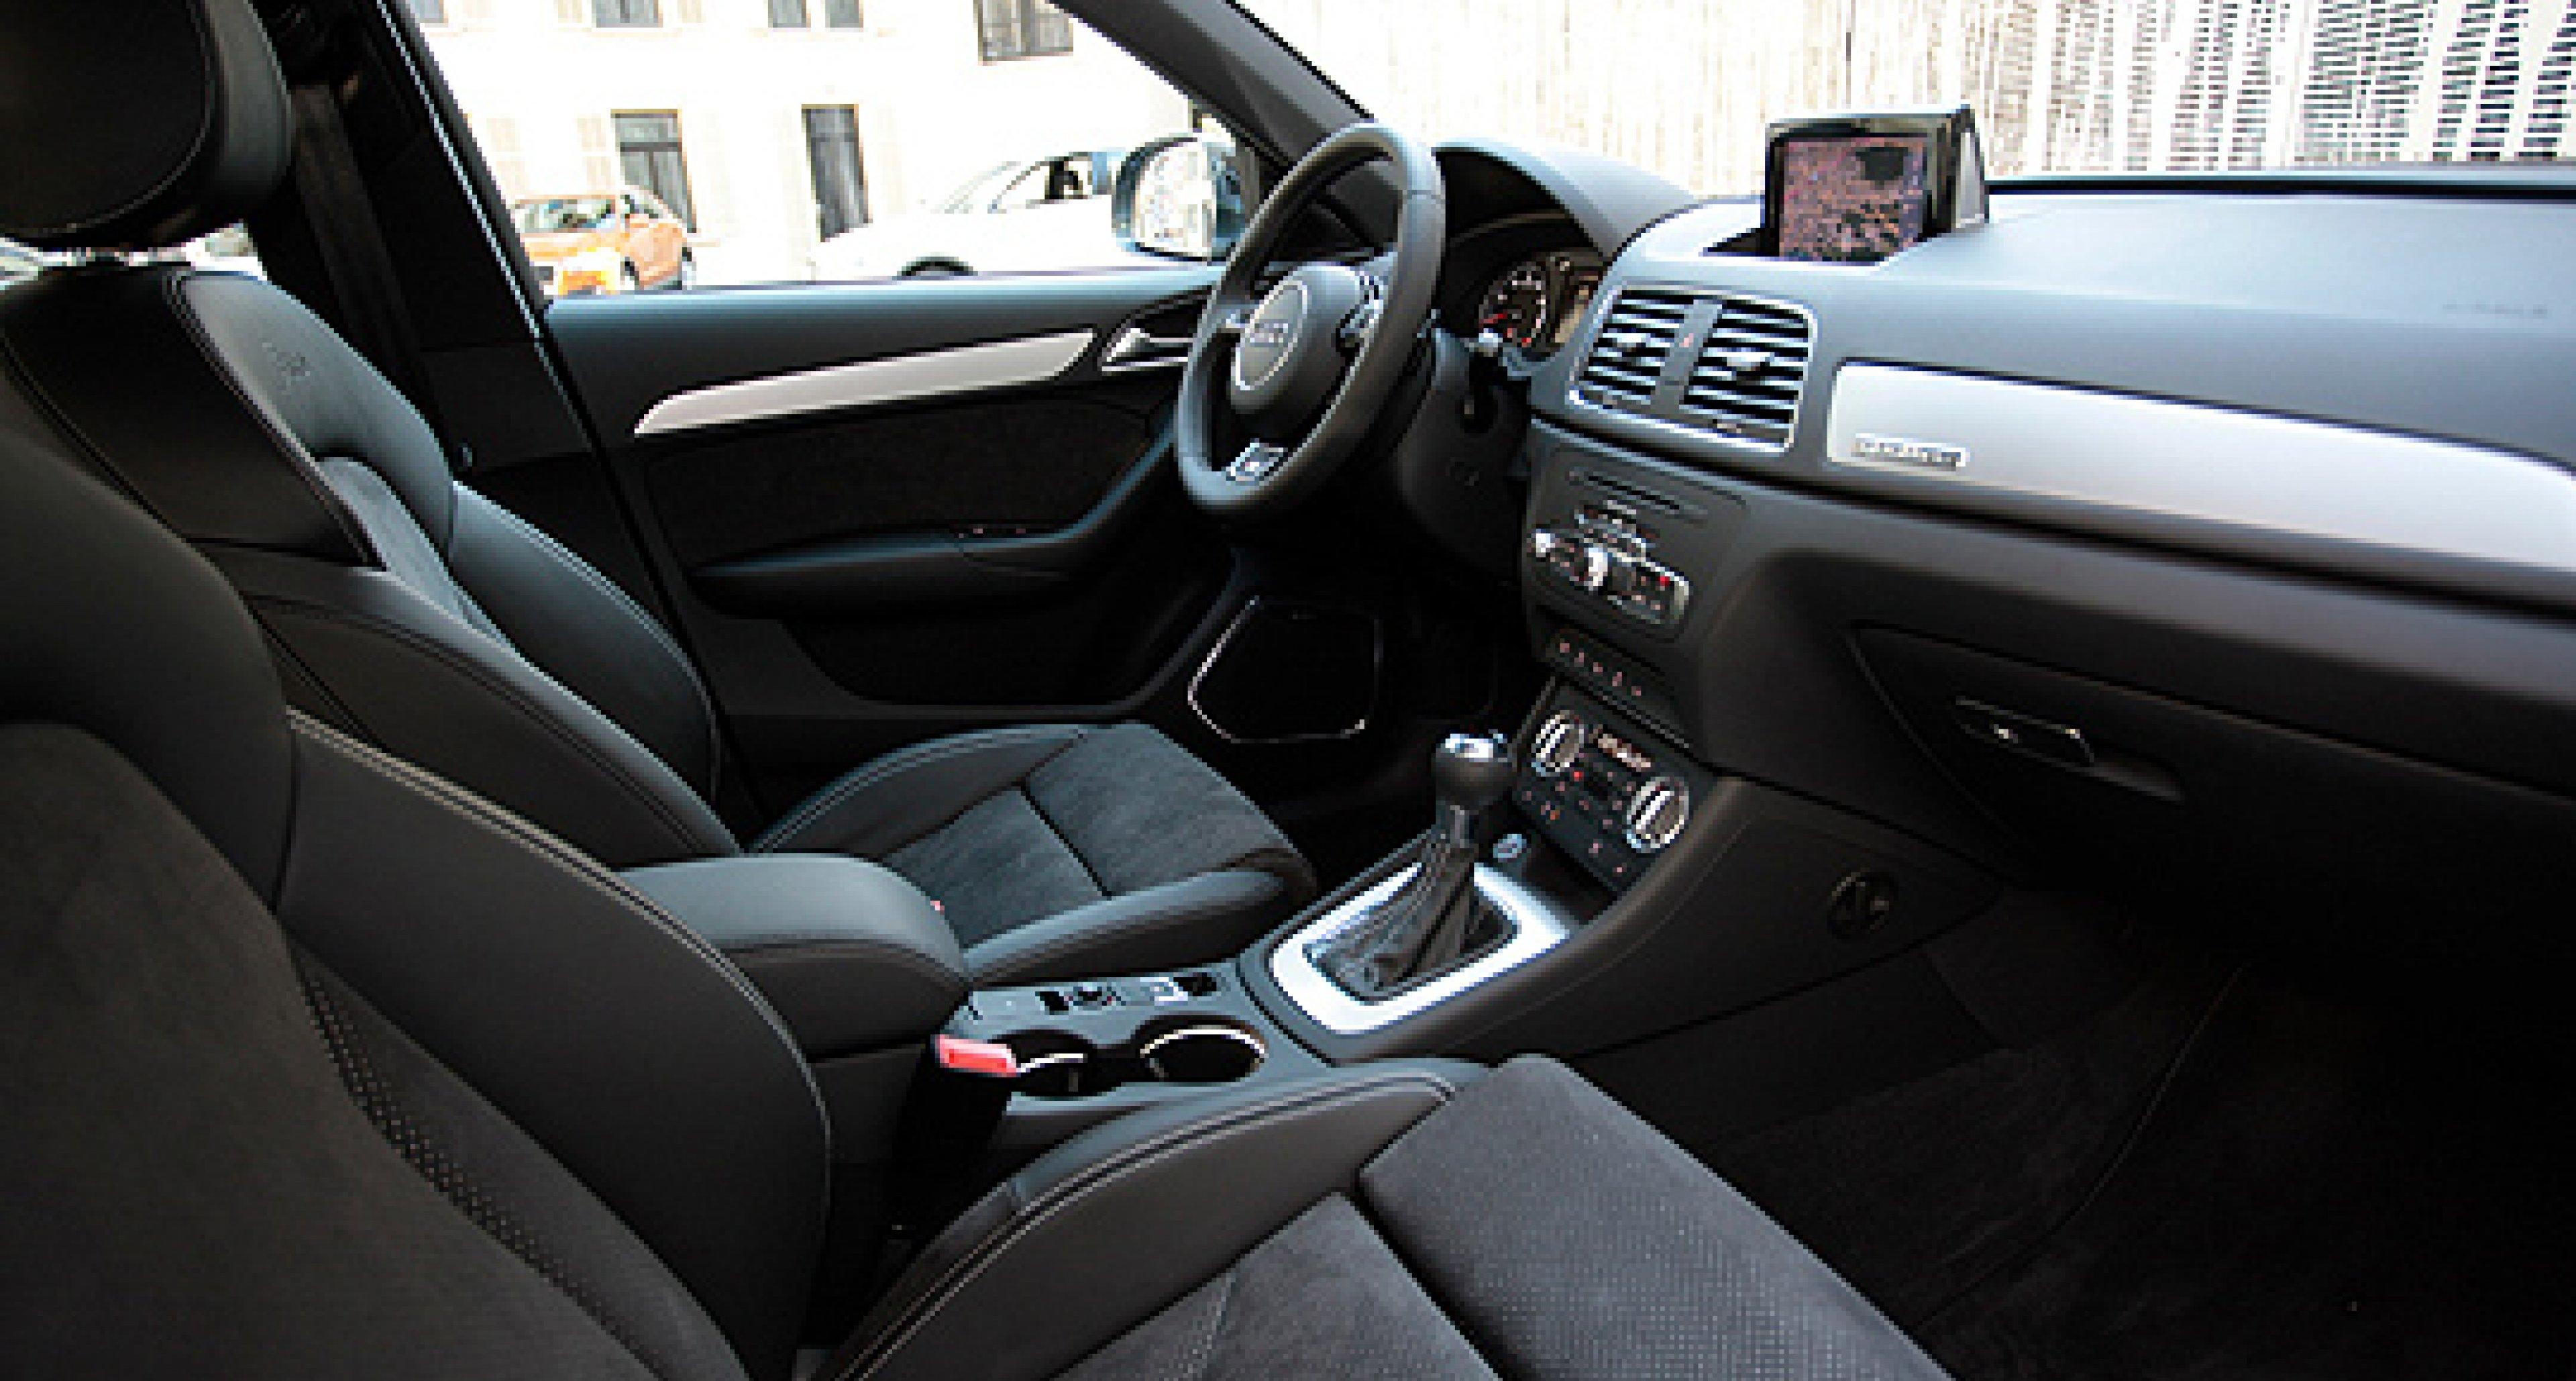 Erste Testfahrt im Audi Q3 Fünfzylinder-Prototyp